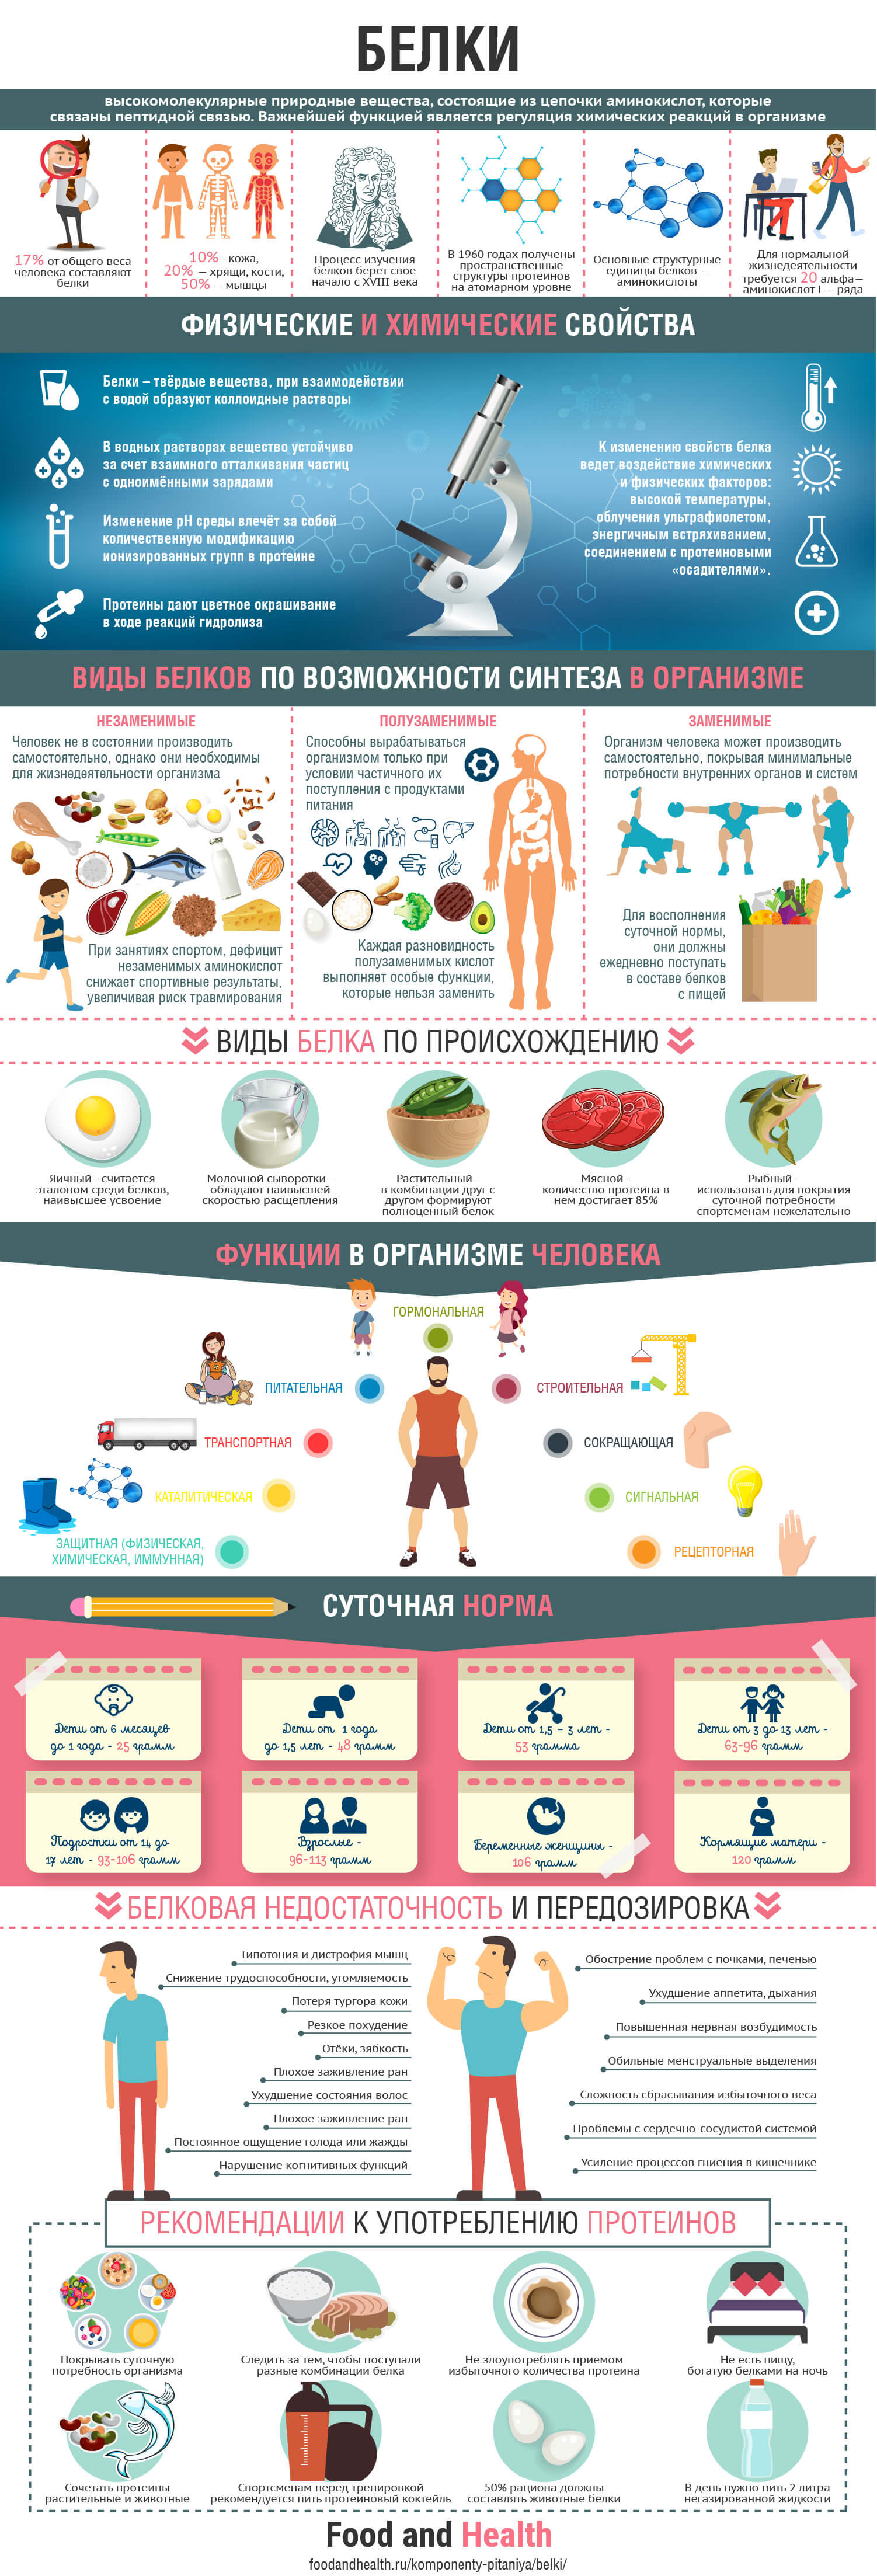 Белки: инфографика